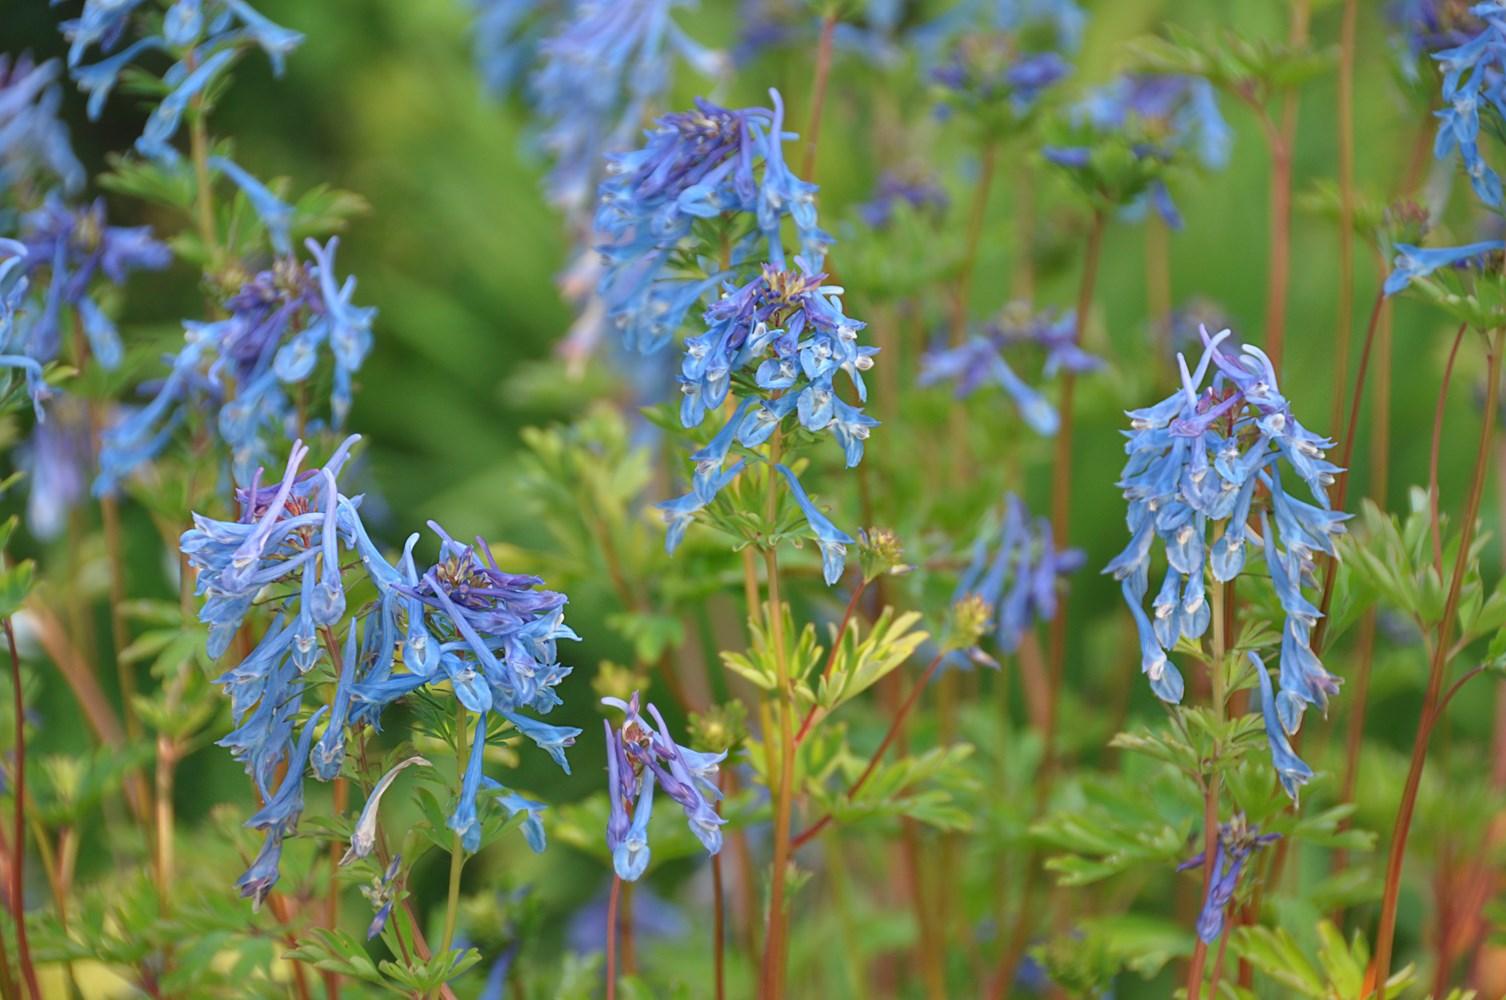 Website/Plants/2144398770/Images/Gallery/c_blue_line_03.0.jpg